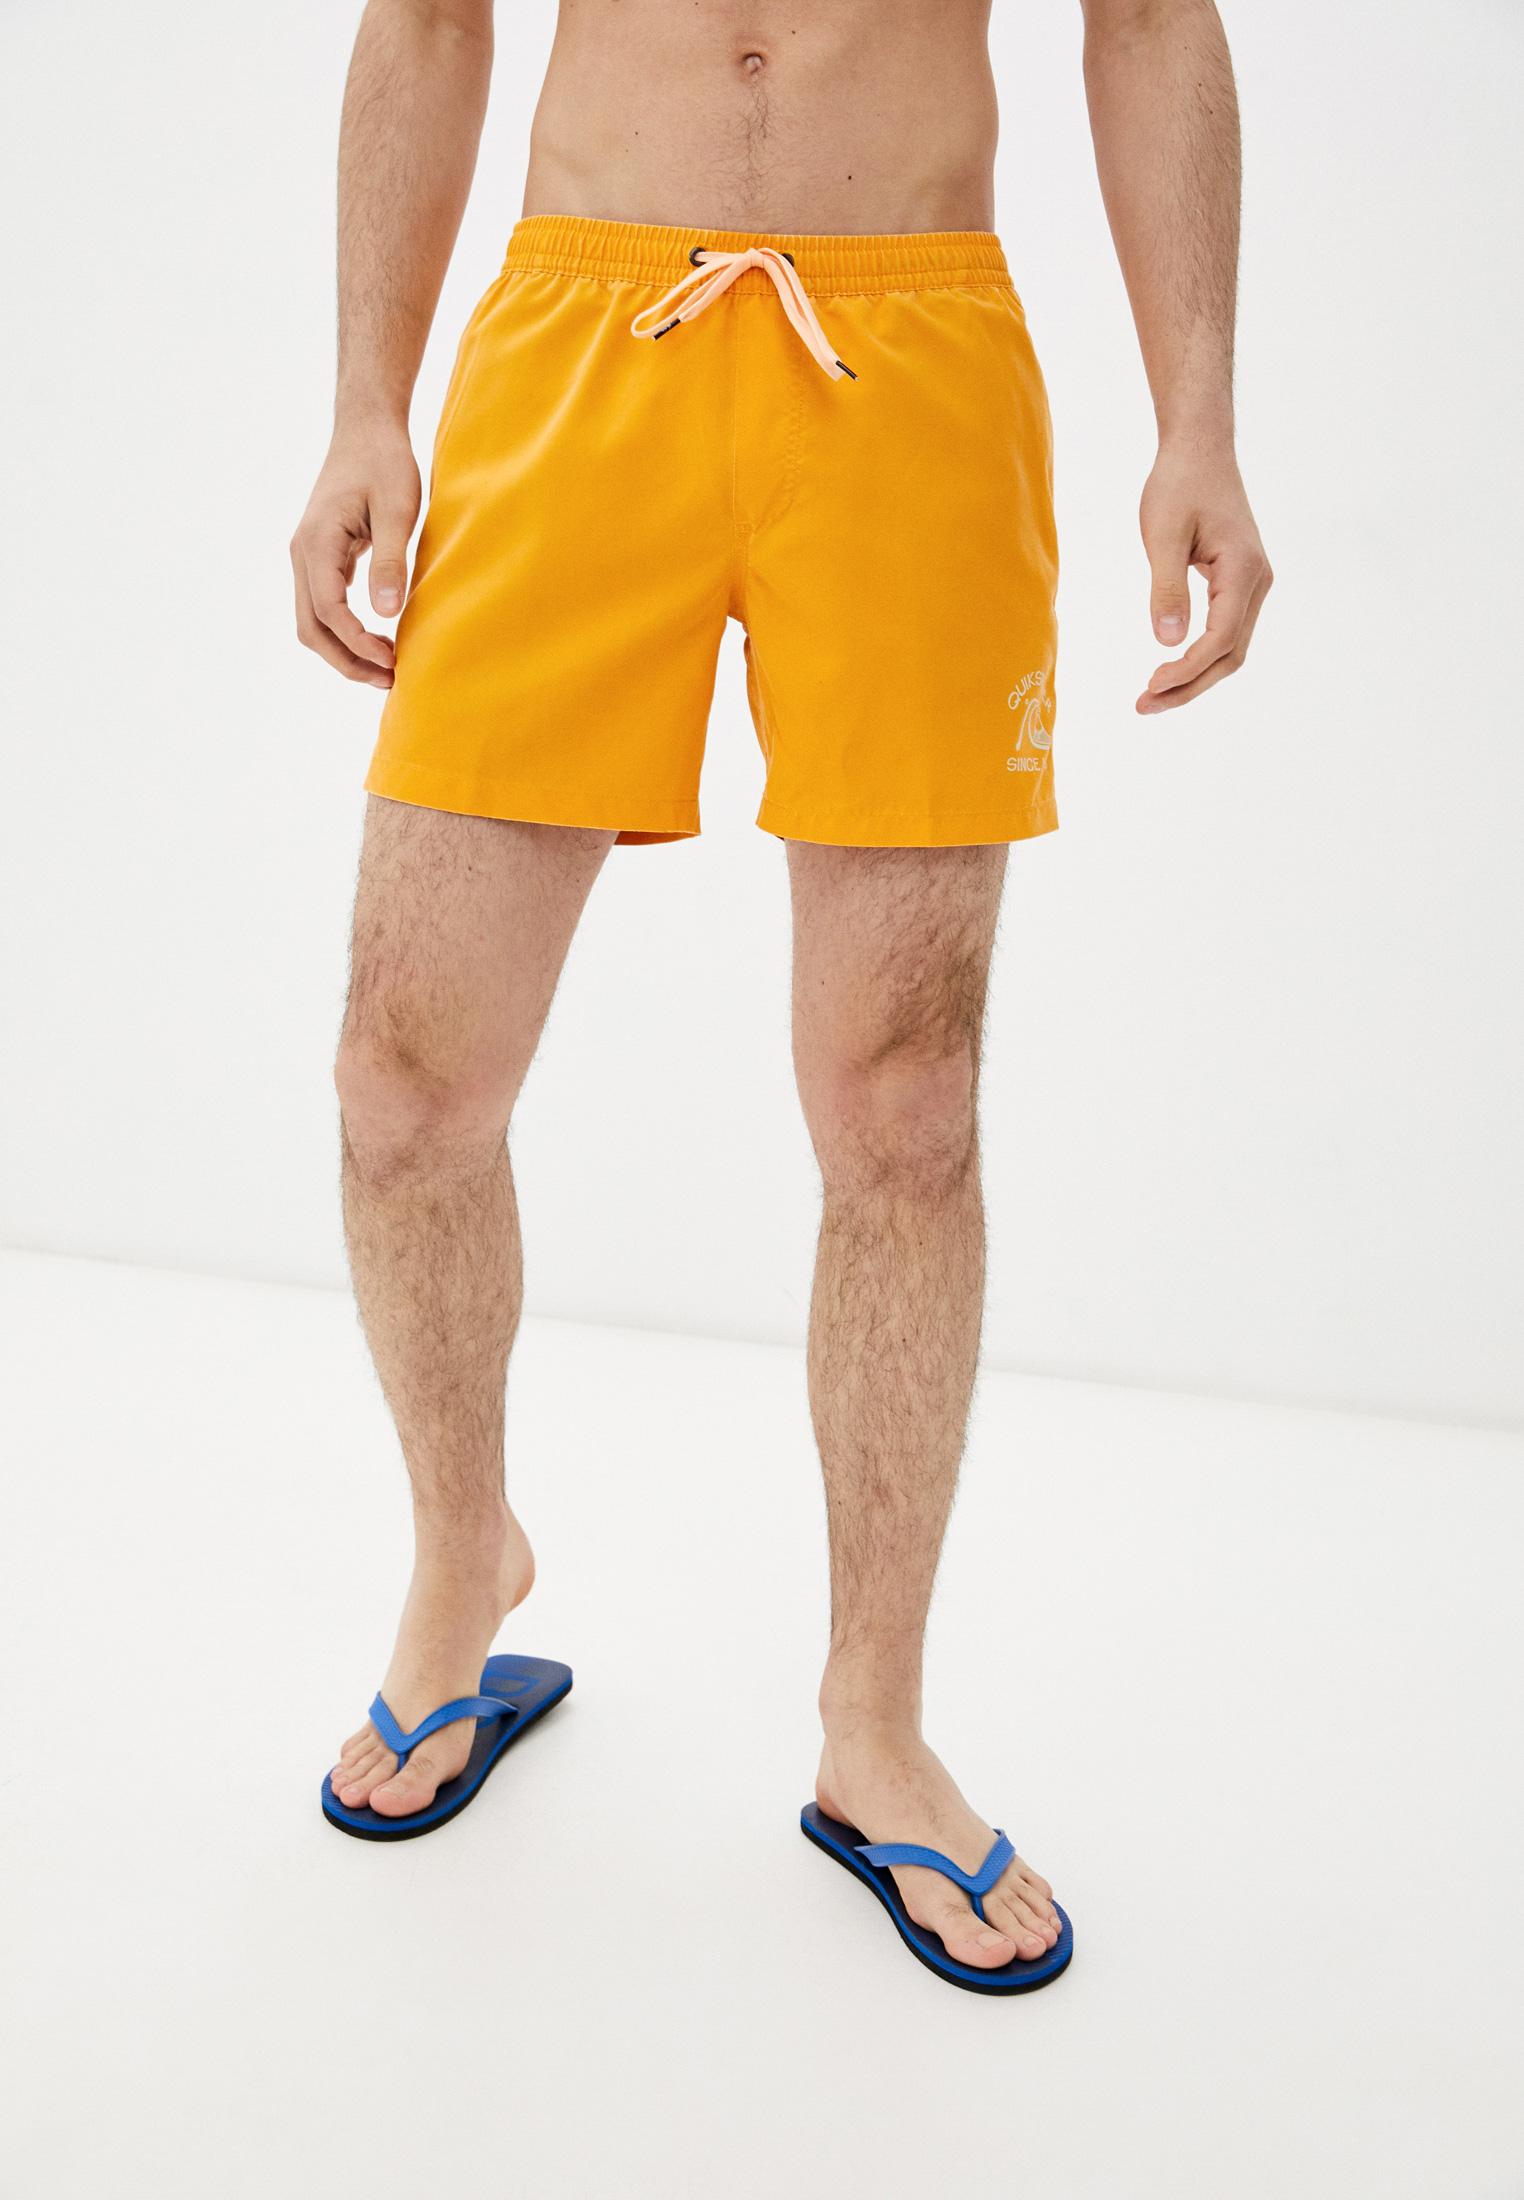 Мужские шорты для плавания Quiksilver (Квиксильвер) EQYJV03692